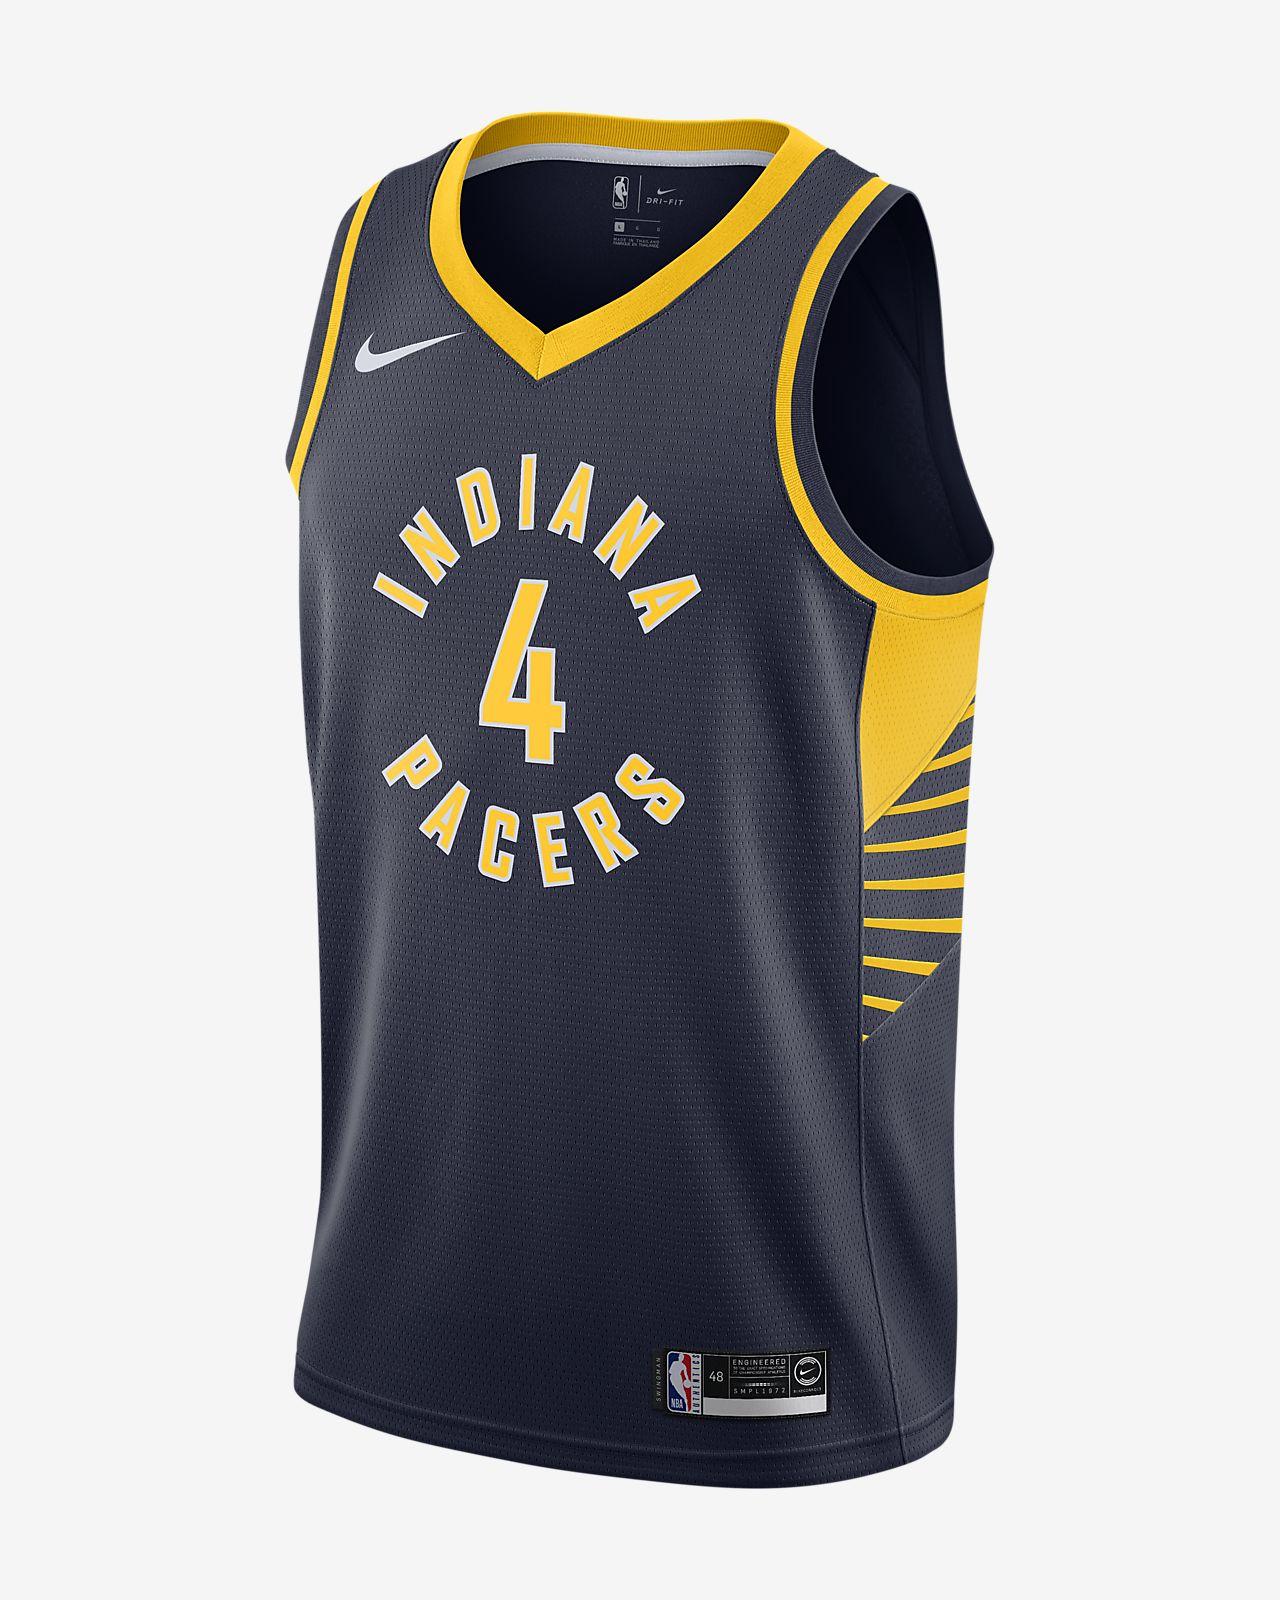 Джерси Nike НБА Swingman Victor Oladipo Pacers Icon Edition